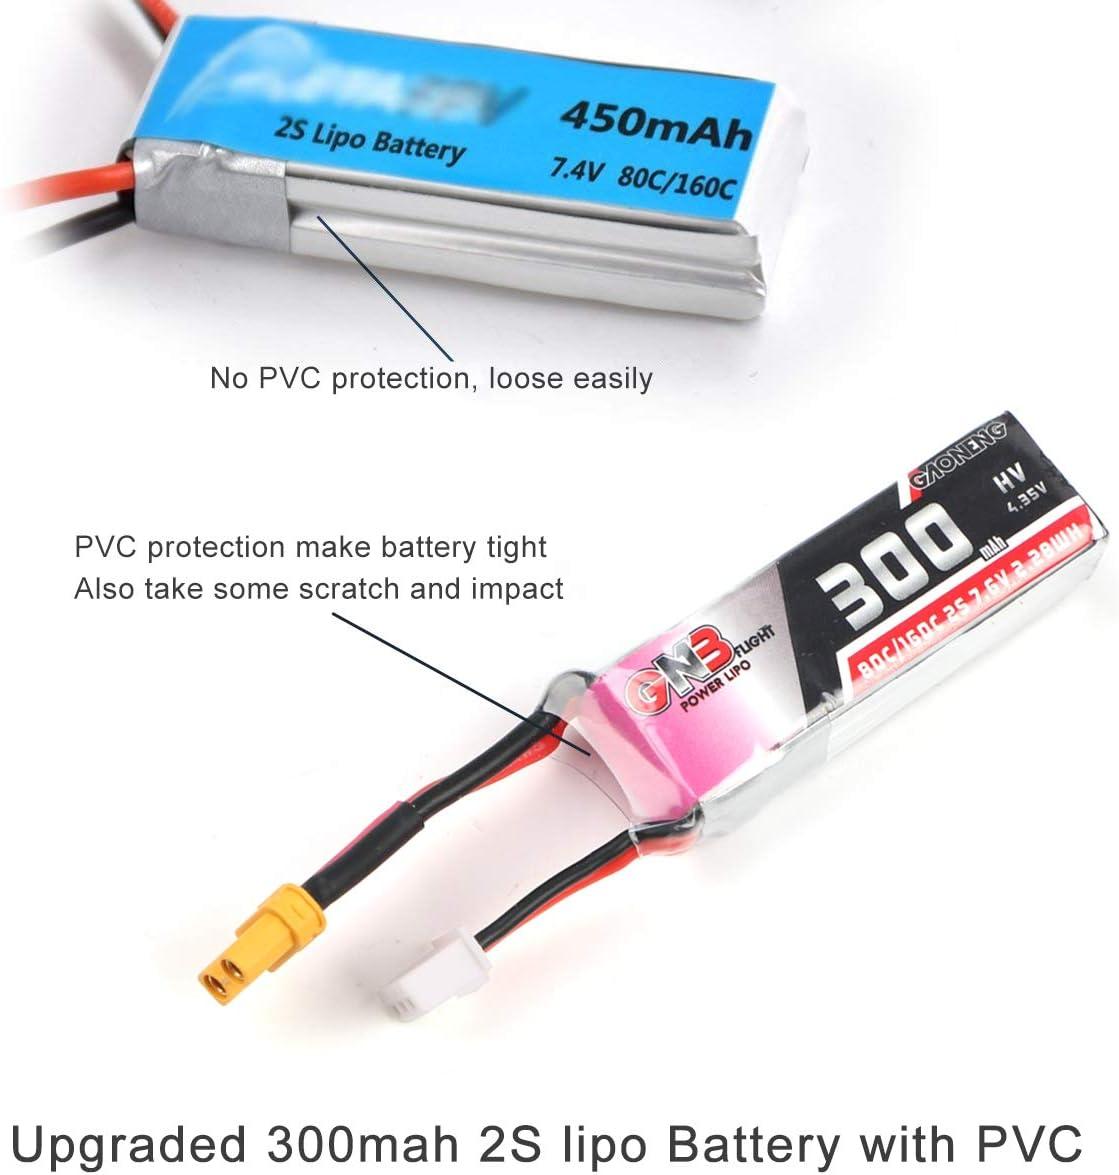 2pcs GAONENG 300mAh 2S 80C//160C 7.6V LiPo Battery HV 2S LiHv Battery with XT30 Plug for Micro FPV Racing Drone Brushless Quadcopter Like Trashcan Betafpv 75X